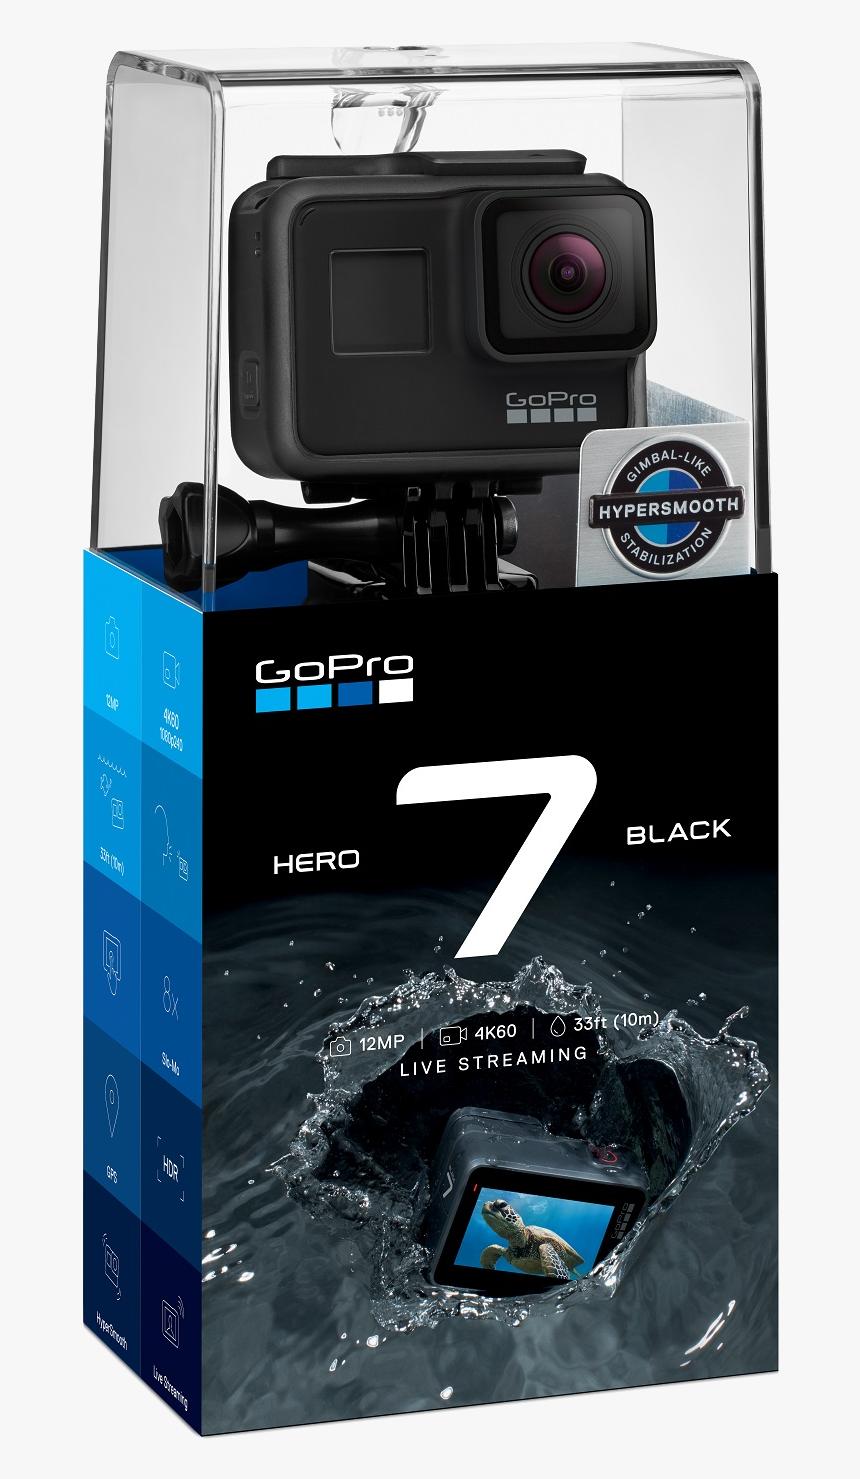 Camara Gopro Hero 7 Black 12mp 4k60 33ft Live Streaming Hd Png